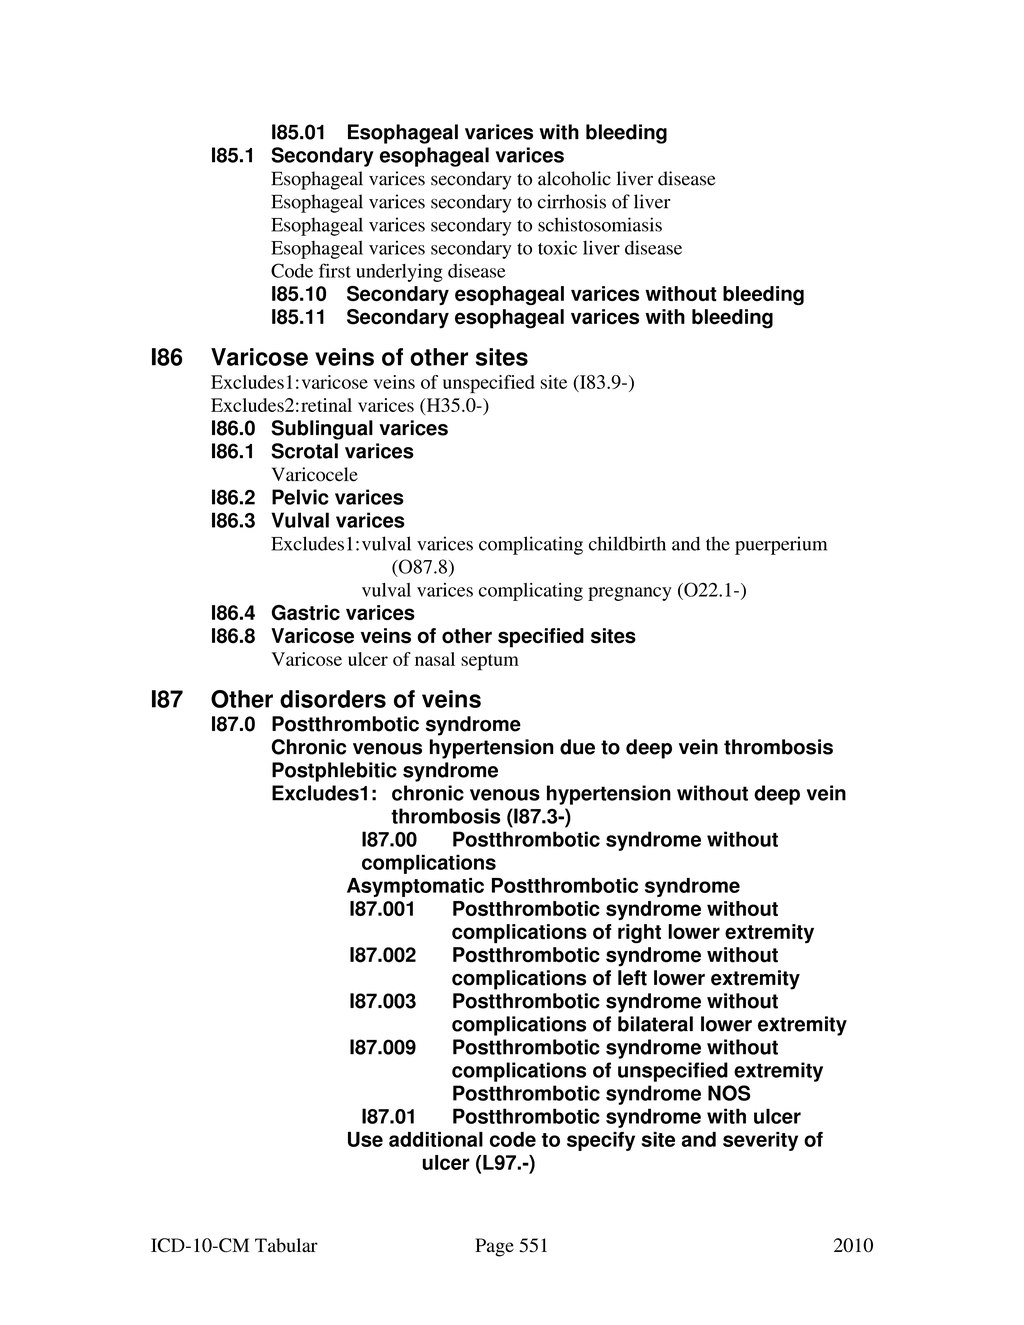 schistosomiasis icd 10)